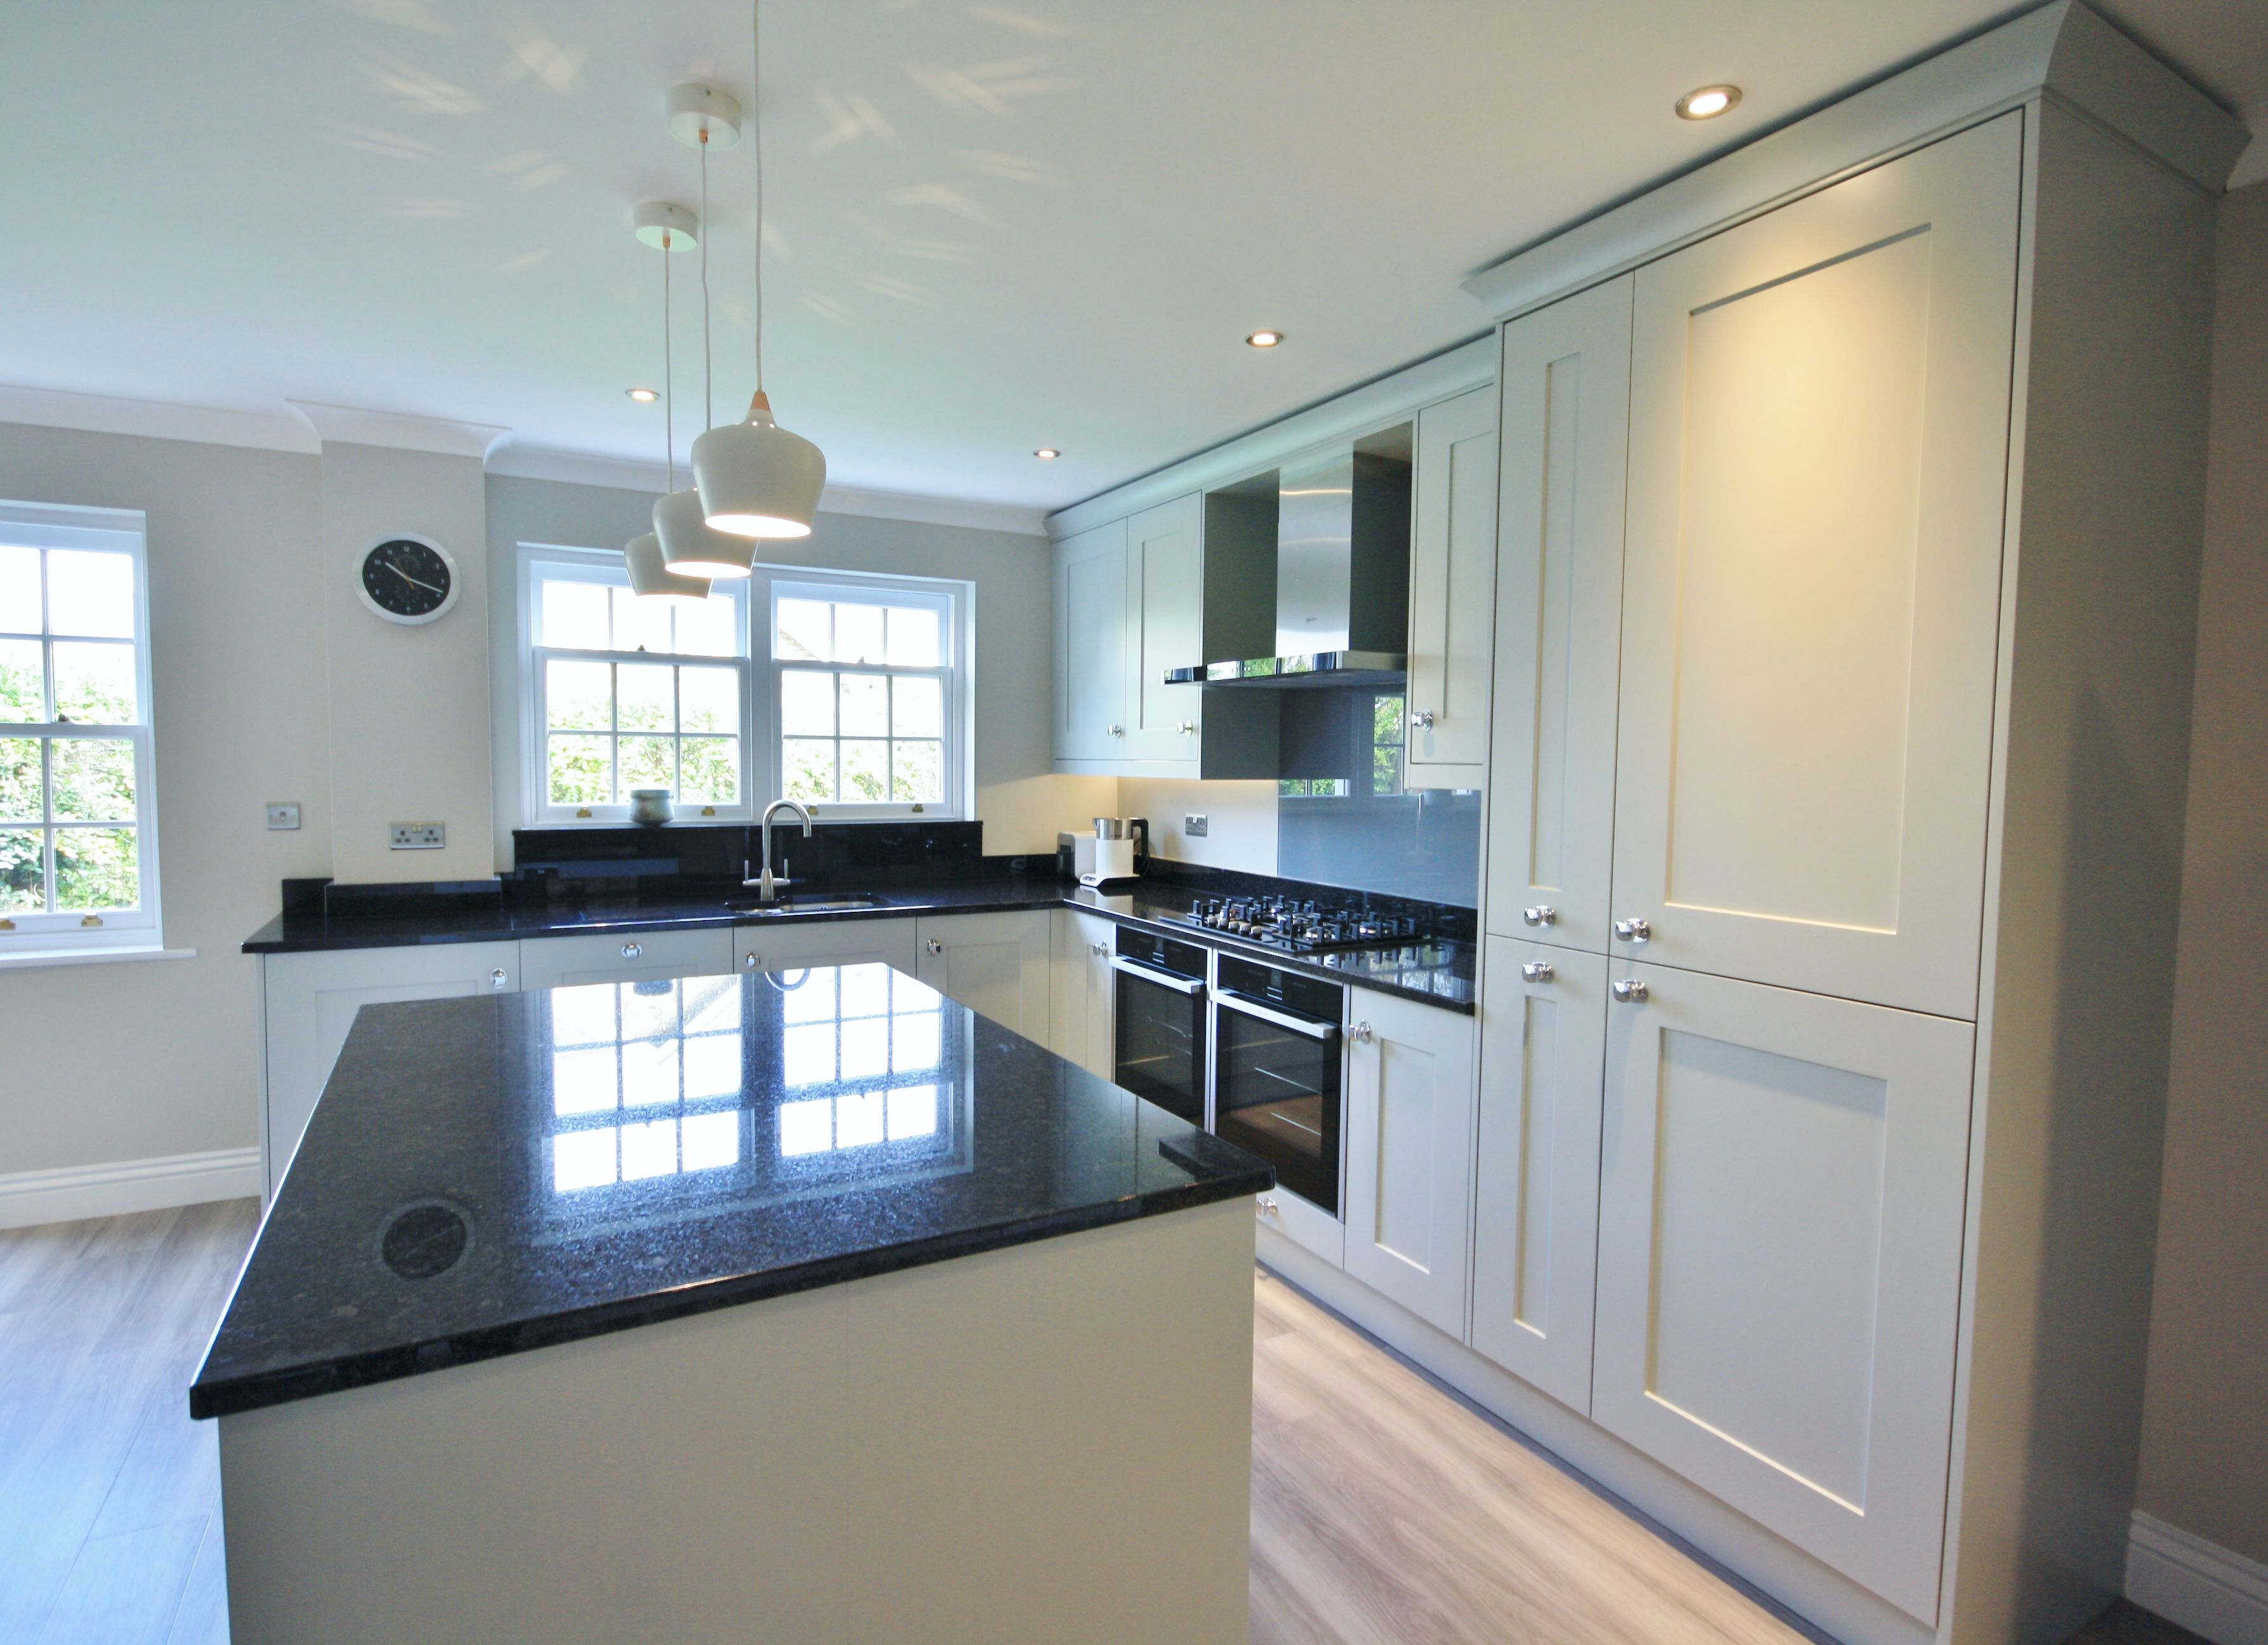 Two window kitchen design  partridge grey units with black granite worktops upstands and